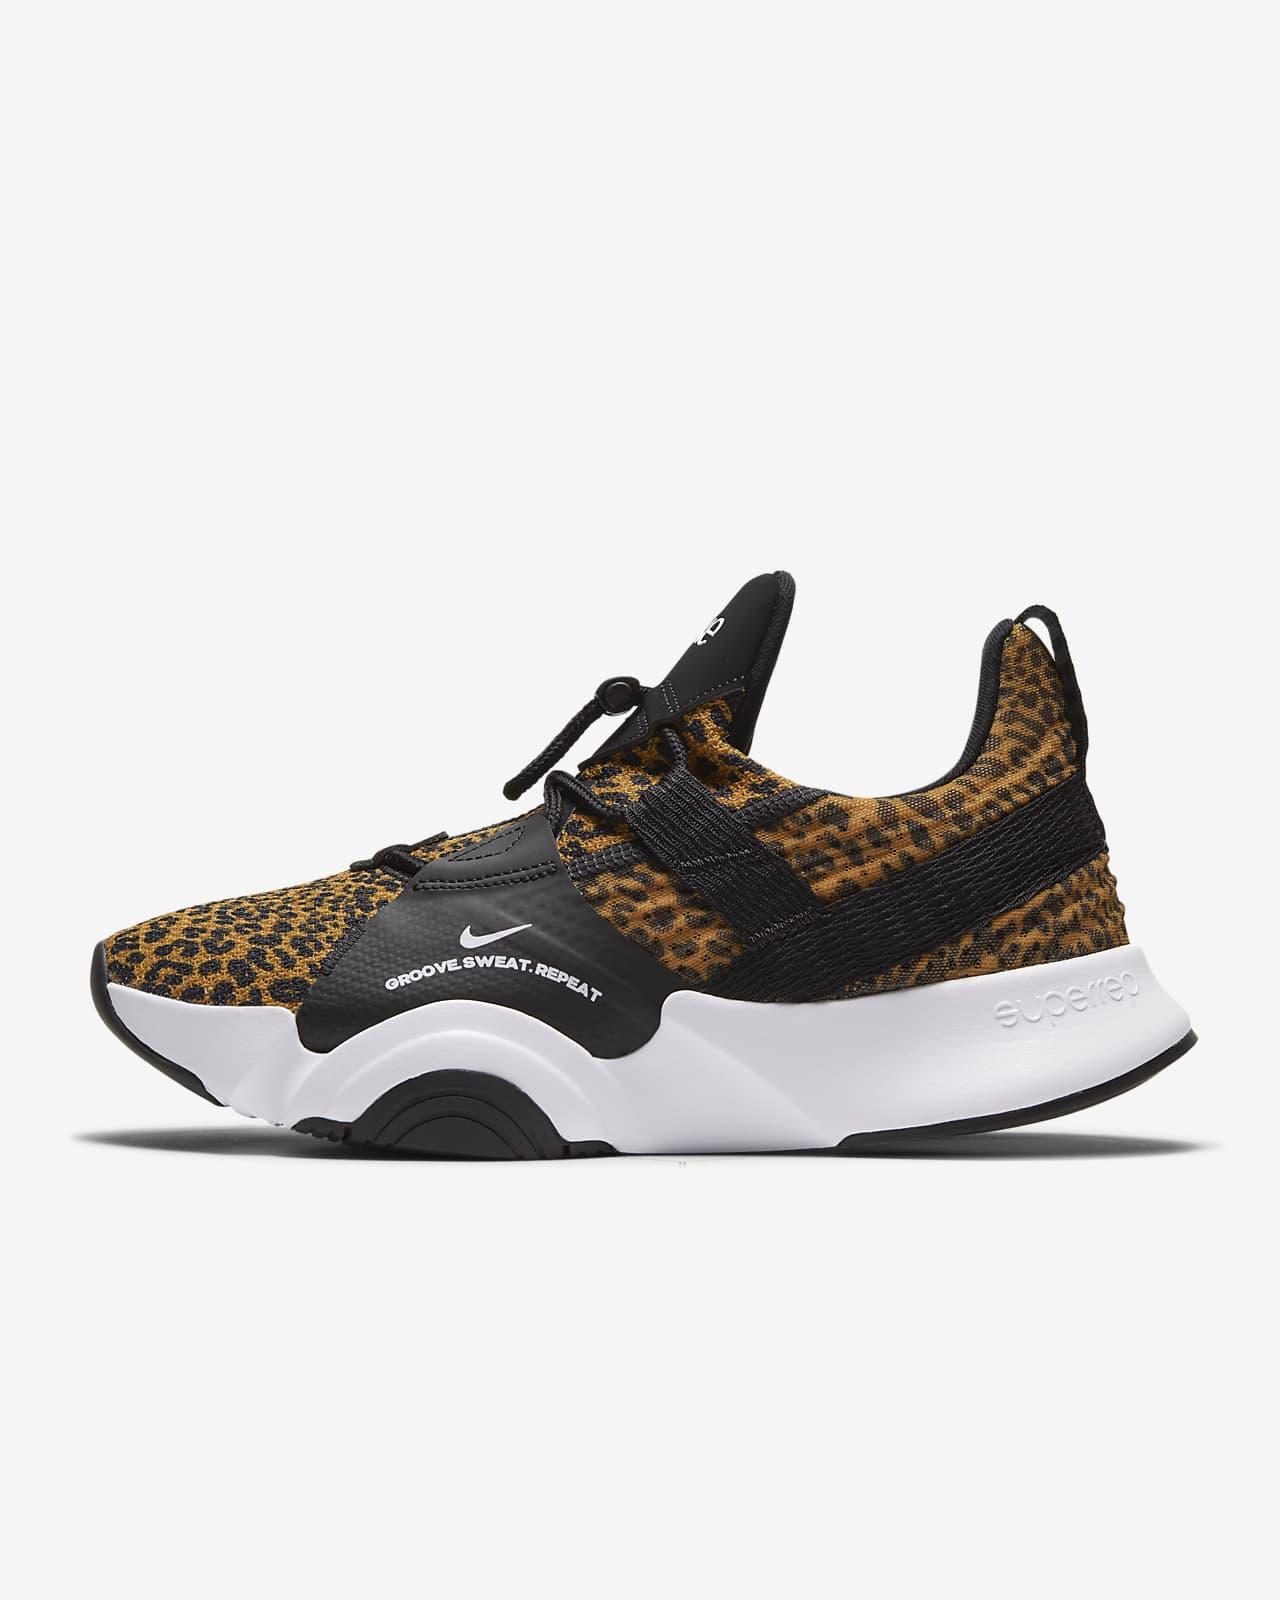 Dámská cardio taneční bota Nike SuperRep Groove